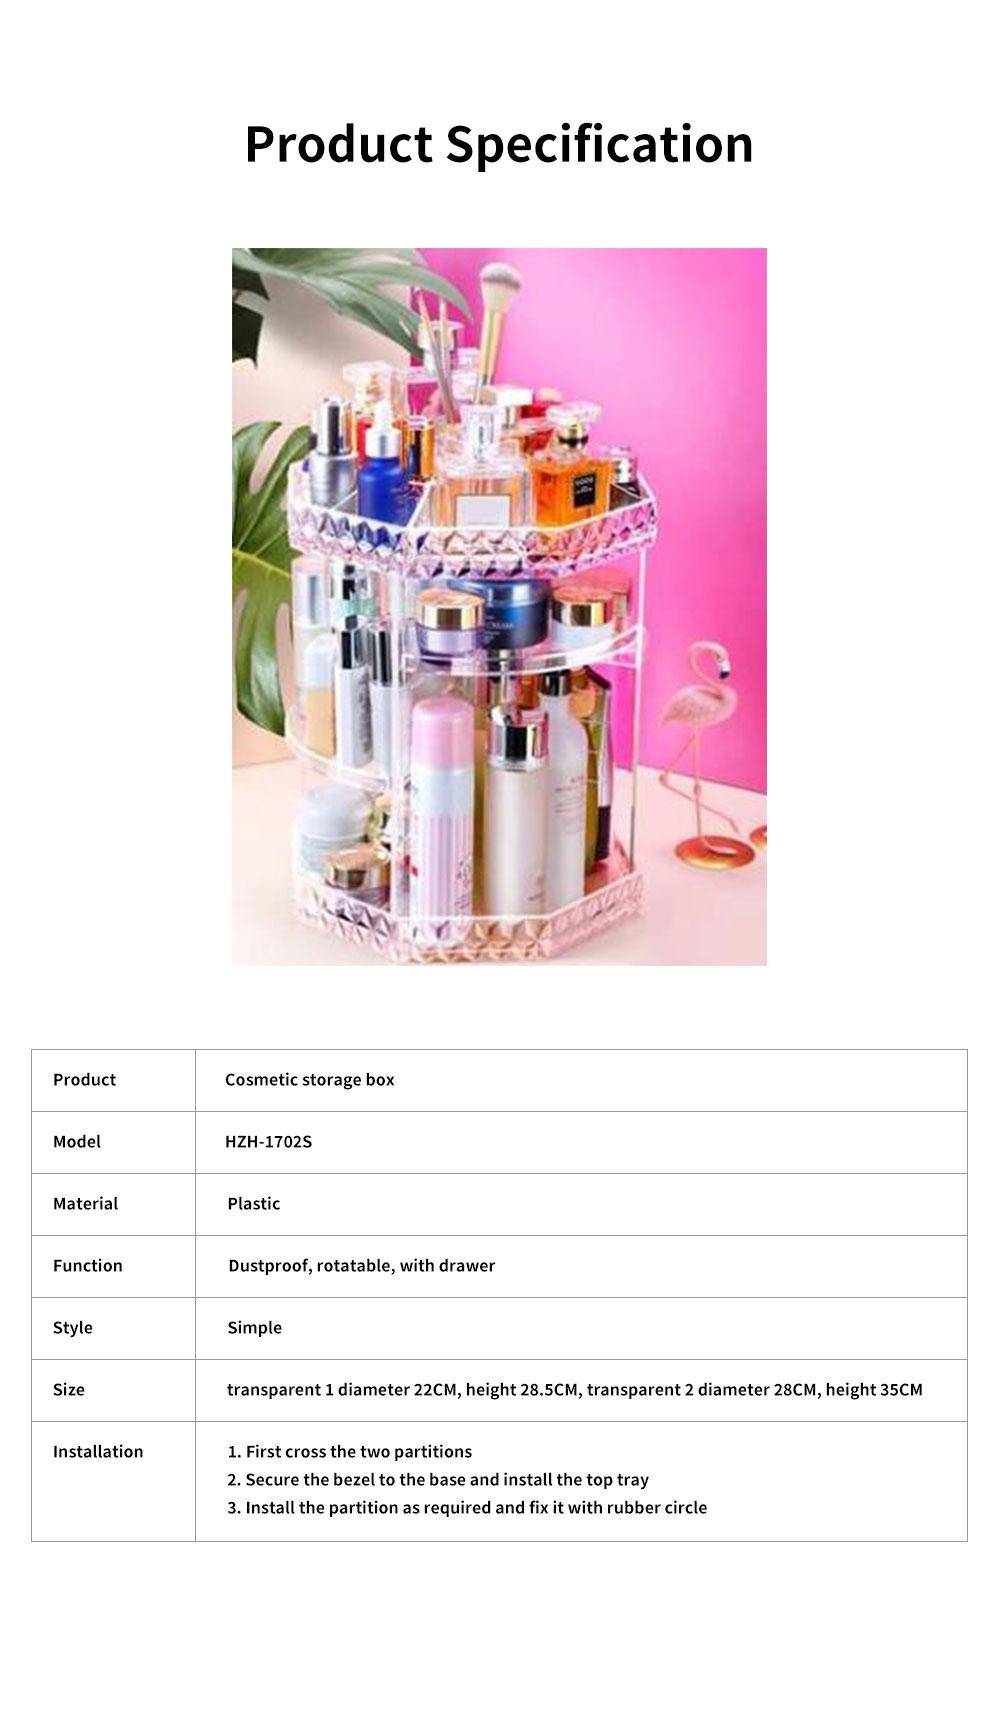 High Quality Plastic 360 Degree Rotating Makeup Organizer Cosmetic Storage Box Lipstick Desktop Shelf Dresser Storage Artifact Transparent 6